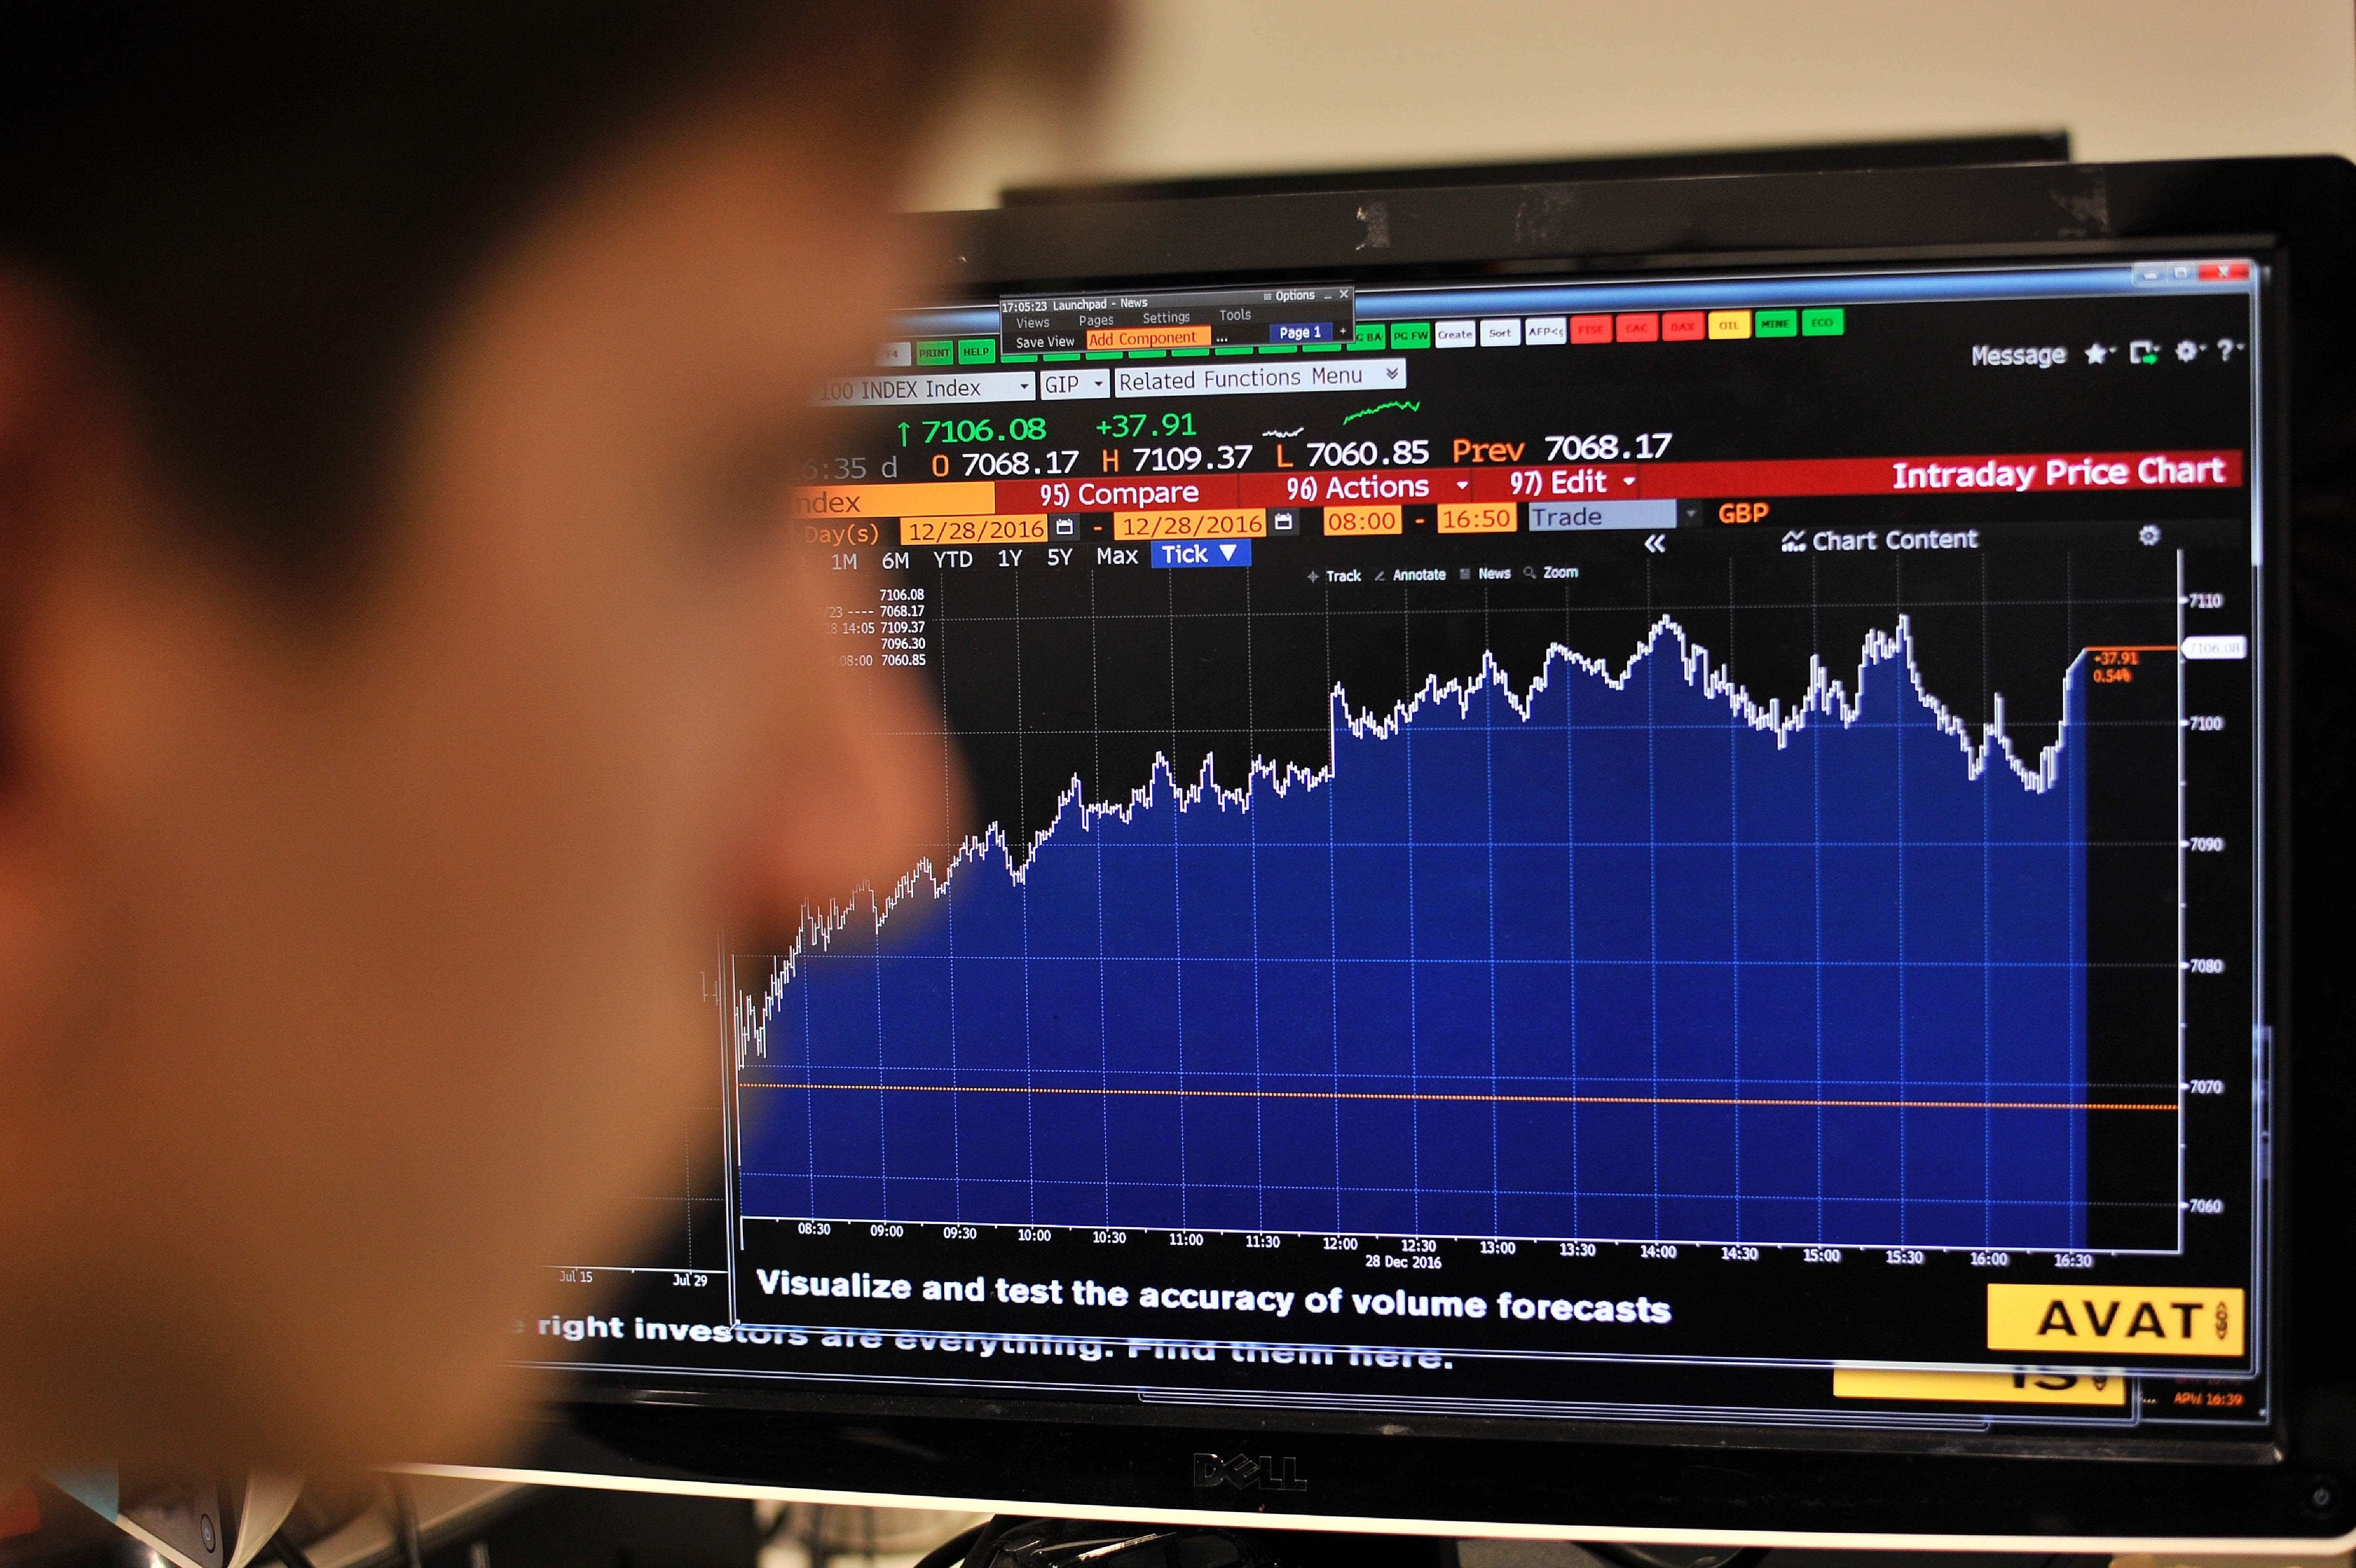 Sanlam sells bond business to Man Group